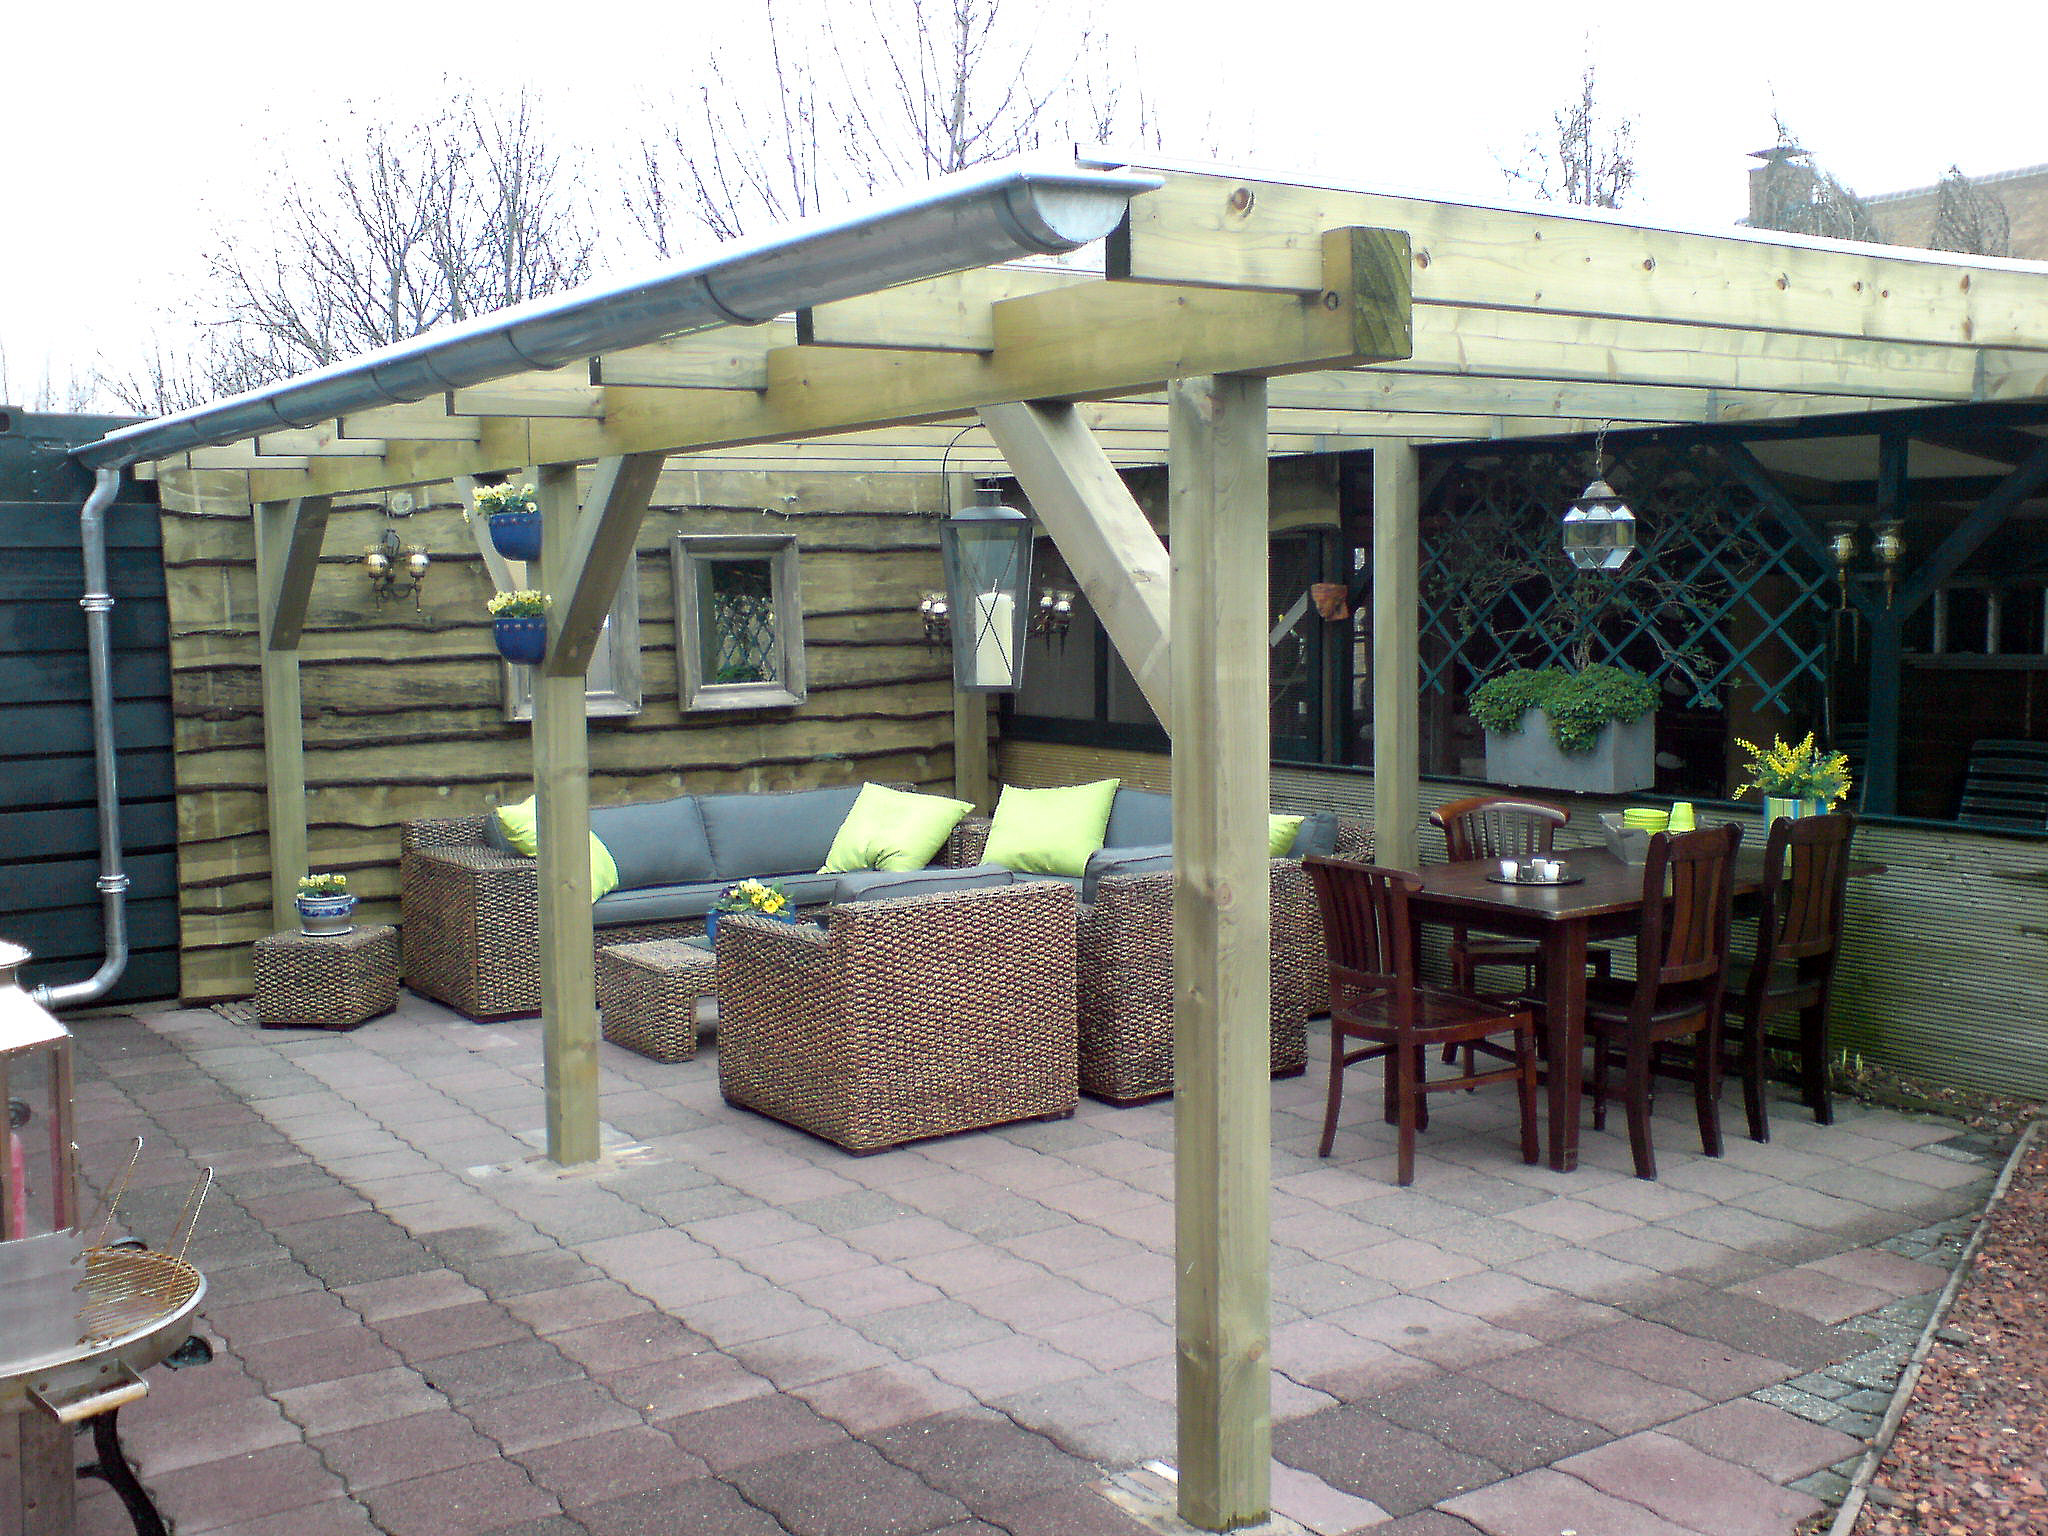 Veranda overkapping veranda plaatsen veranda plaza veranda prijzen veranda showroom veranda for Terasse ontwerp